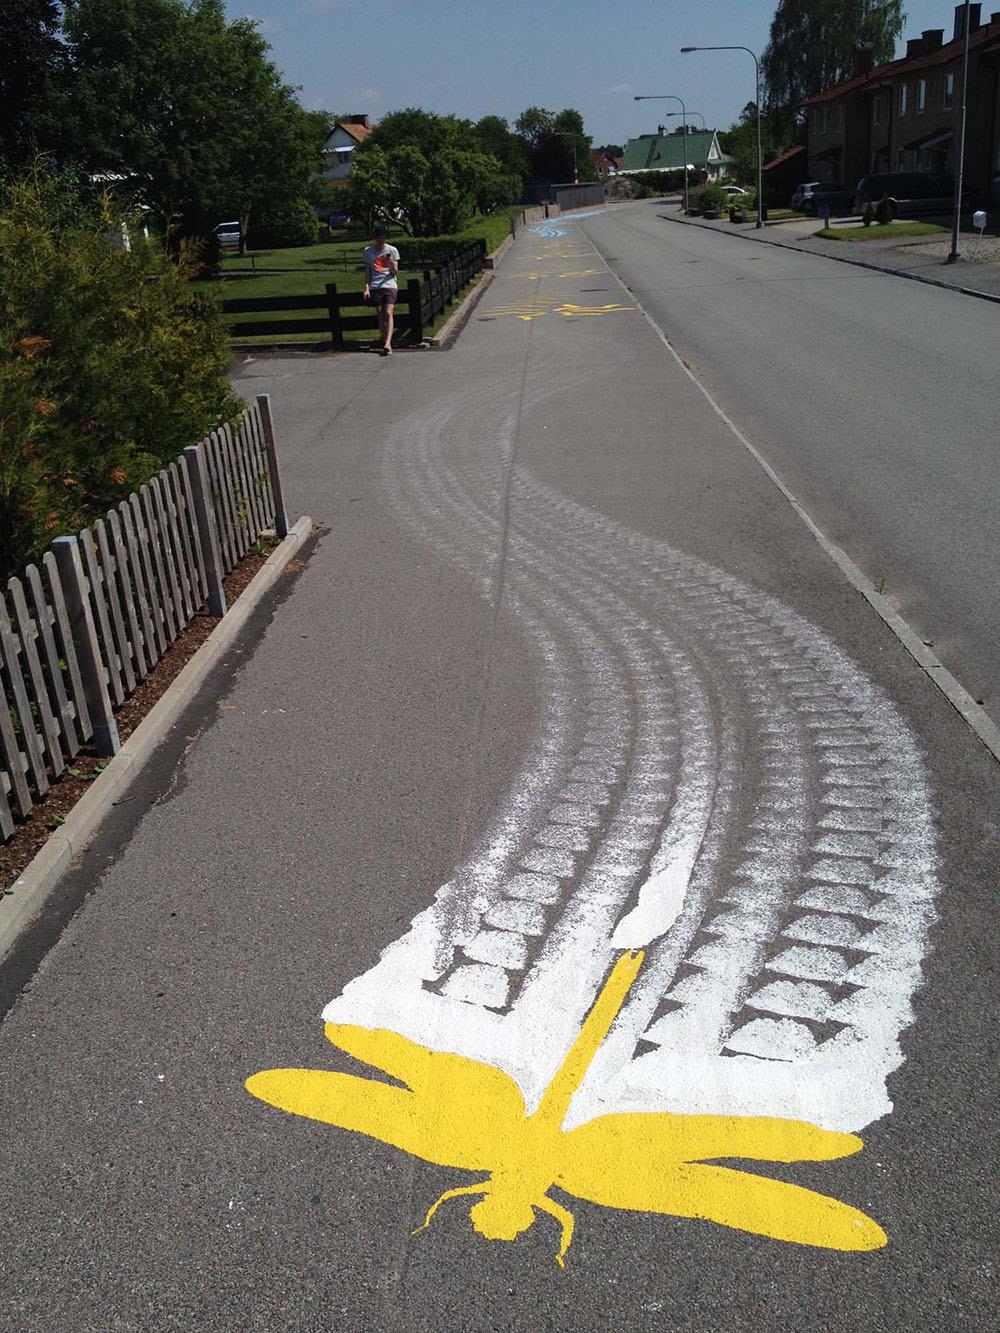 roadaworth-street-art-06